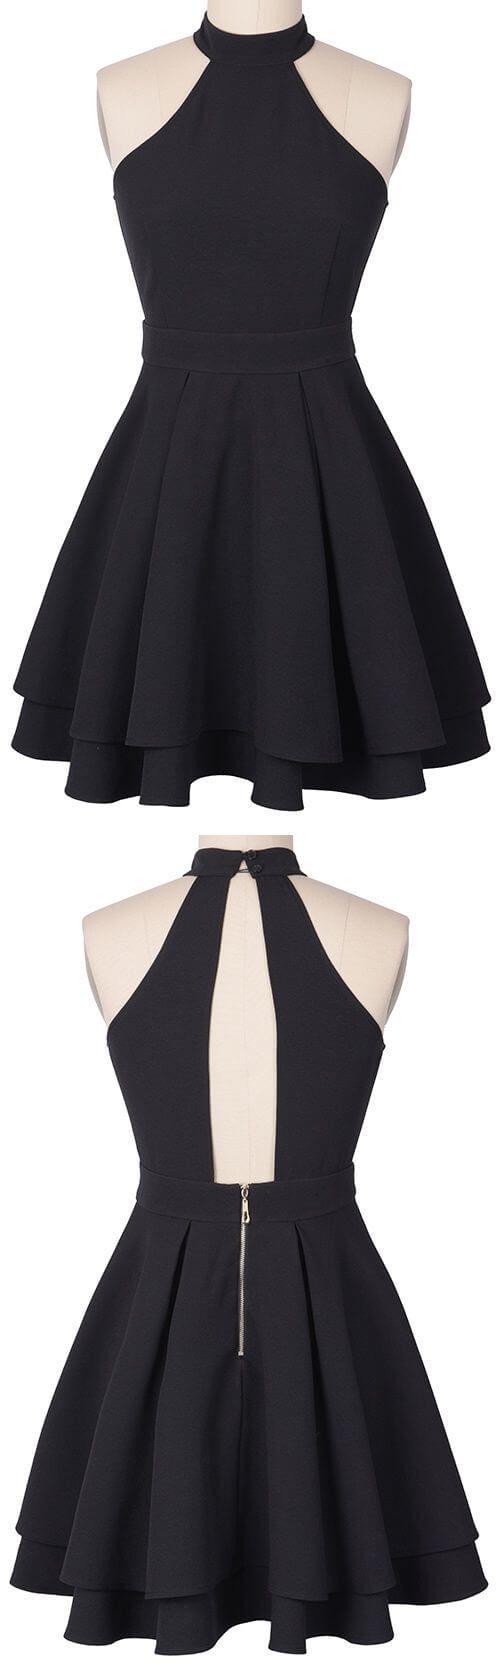 Halter black open back homecoming dress party dressesed high